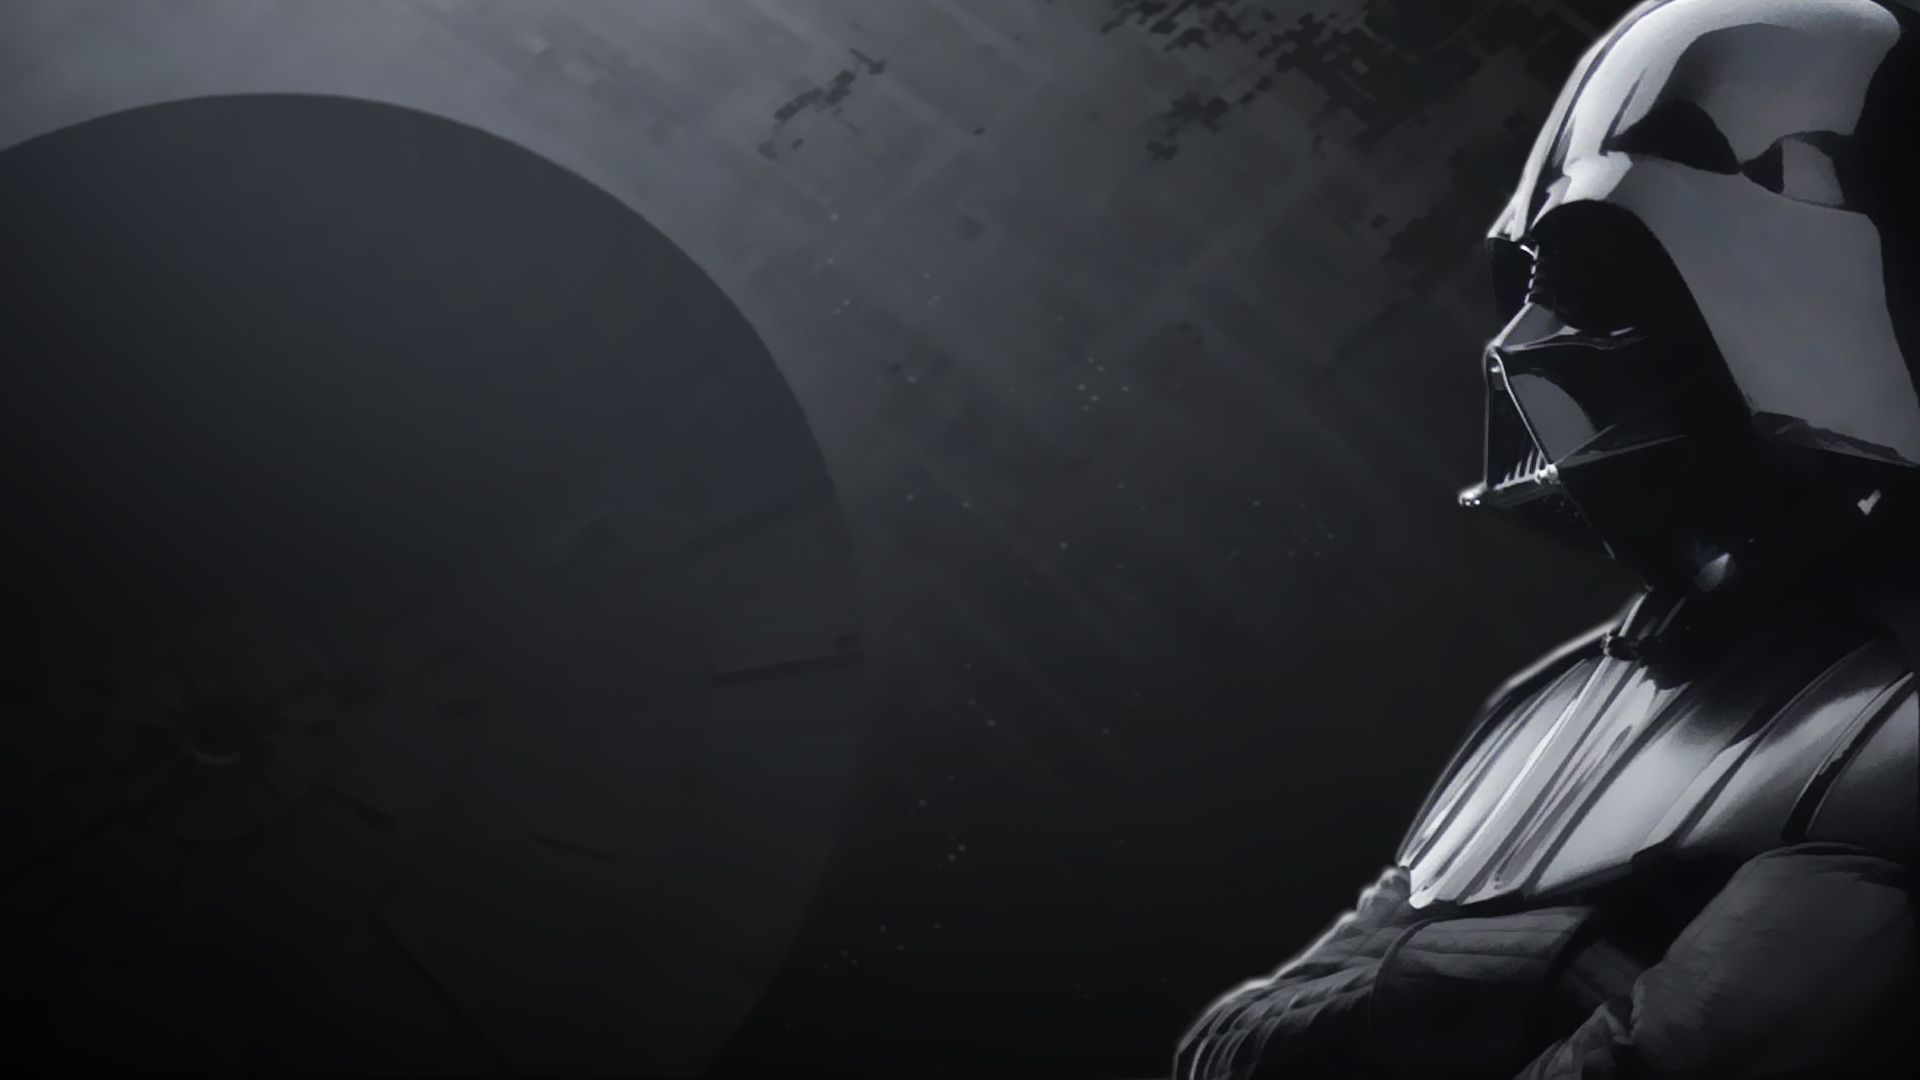 Full Hd P Darth Vader Wallpapers Hd Desktop Backgrounds Walle